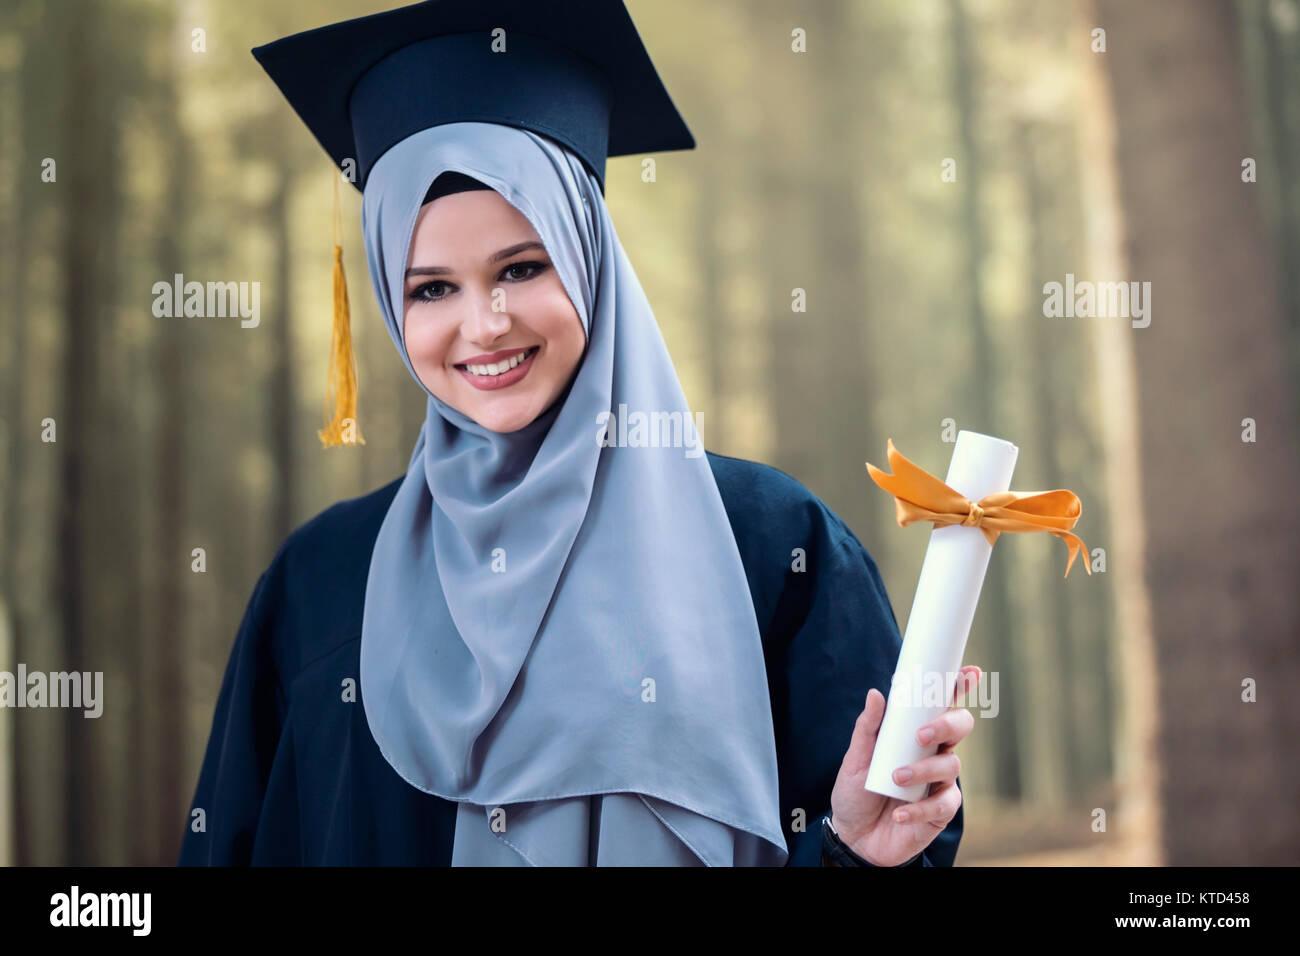 181288635ed Muslim Graduation Stock Photos   Muslim Graduation Stock Images - Alamy